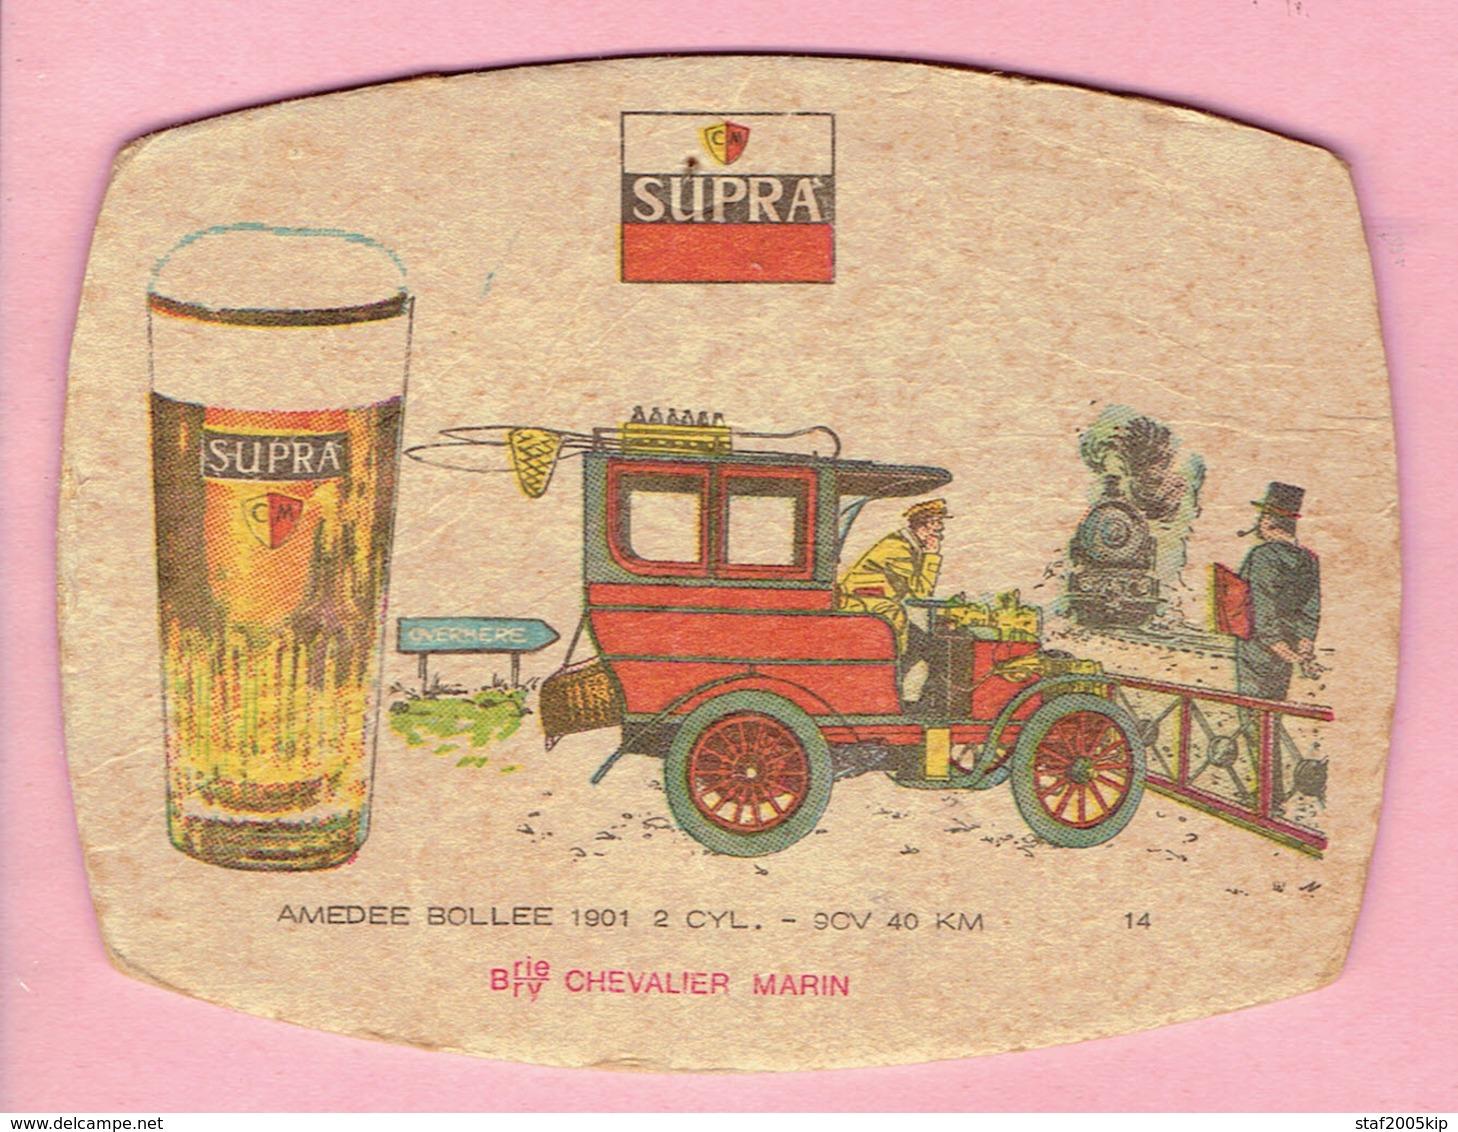 Bierviltje - SUPRA - CHEVALIER MARIN - AMEDEE BOLLEE 1901 - 2 CYL. - 9CV  40 Km - Overmeire - Portavasos